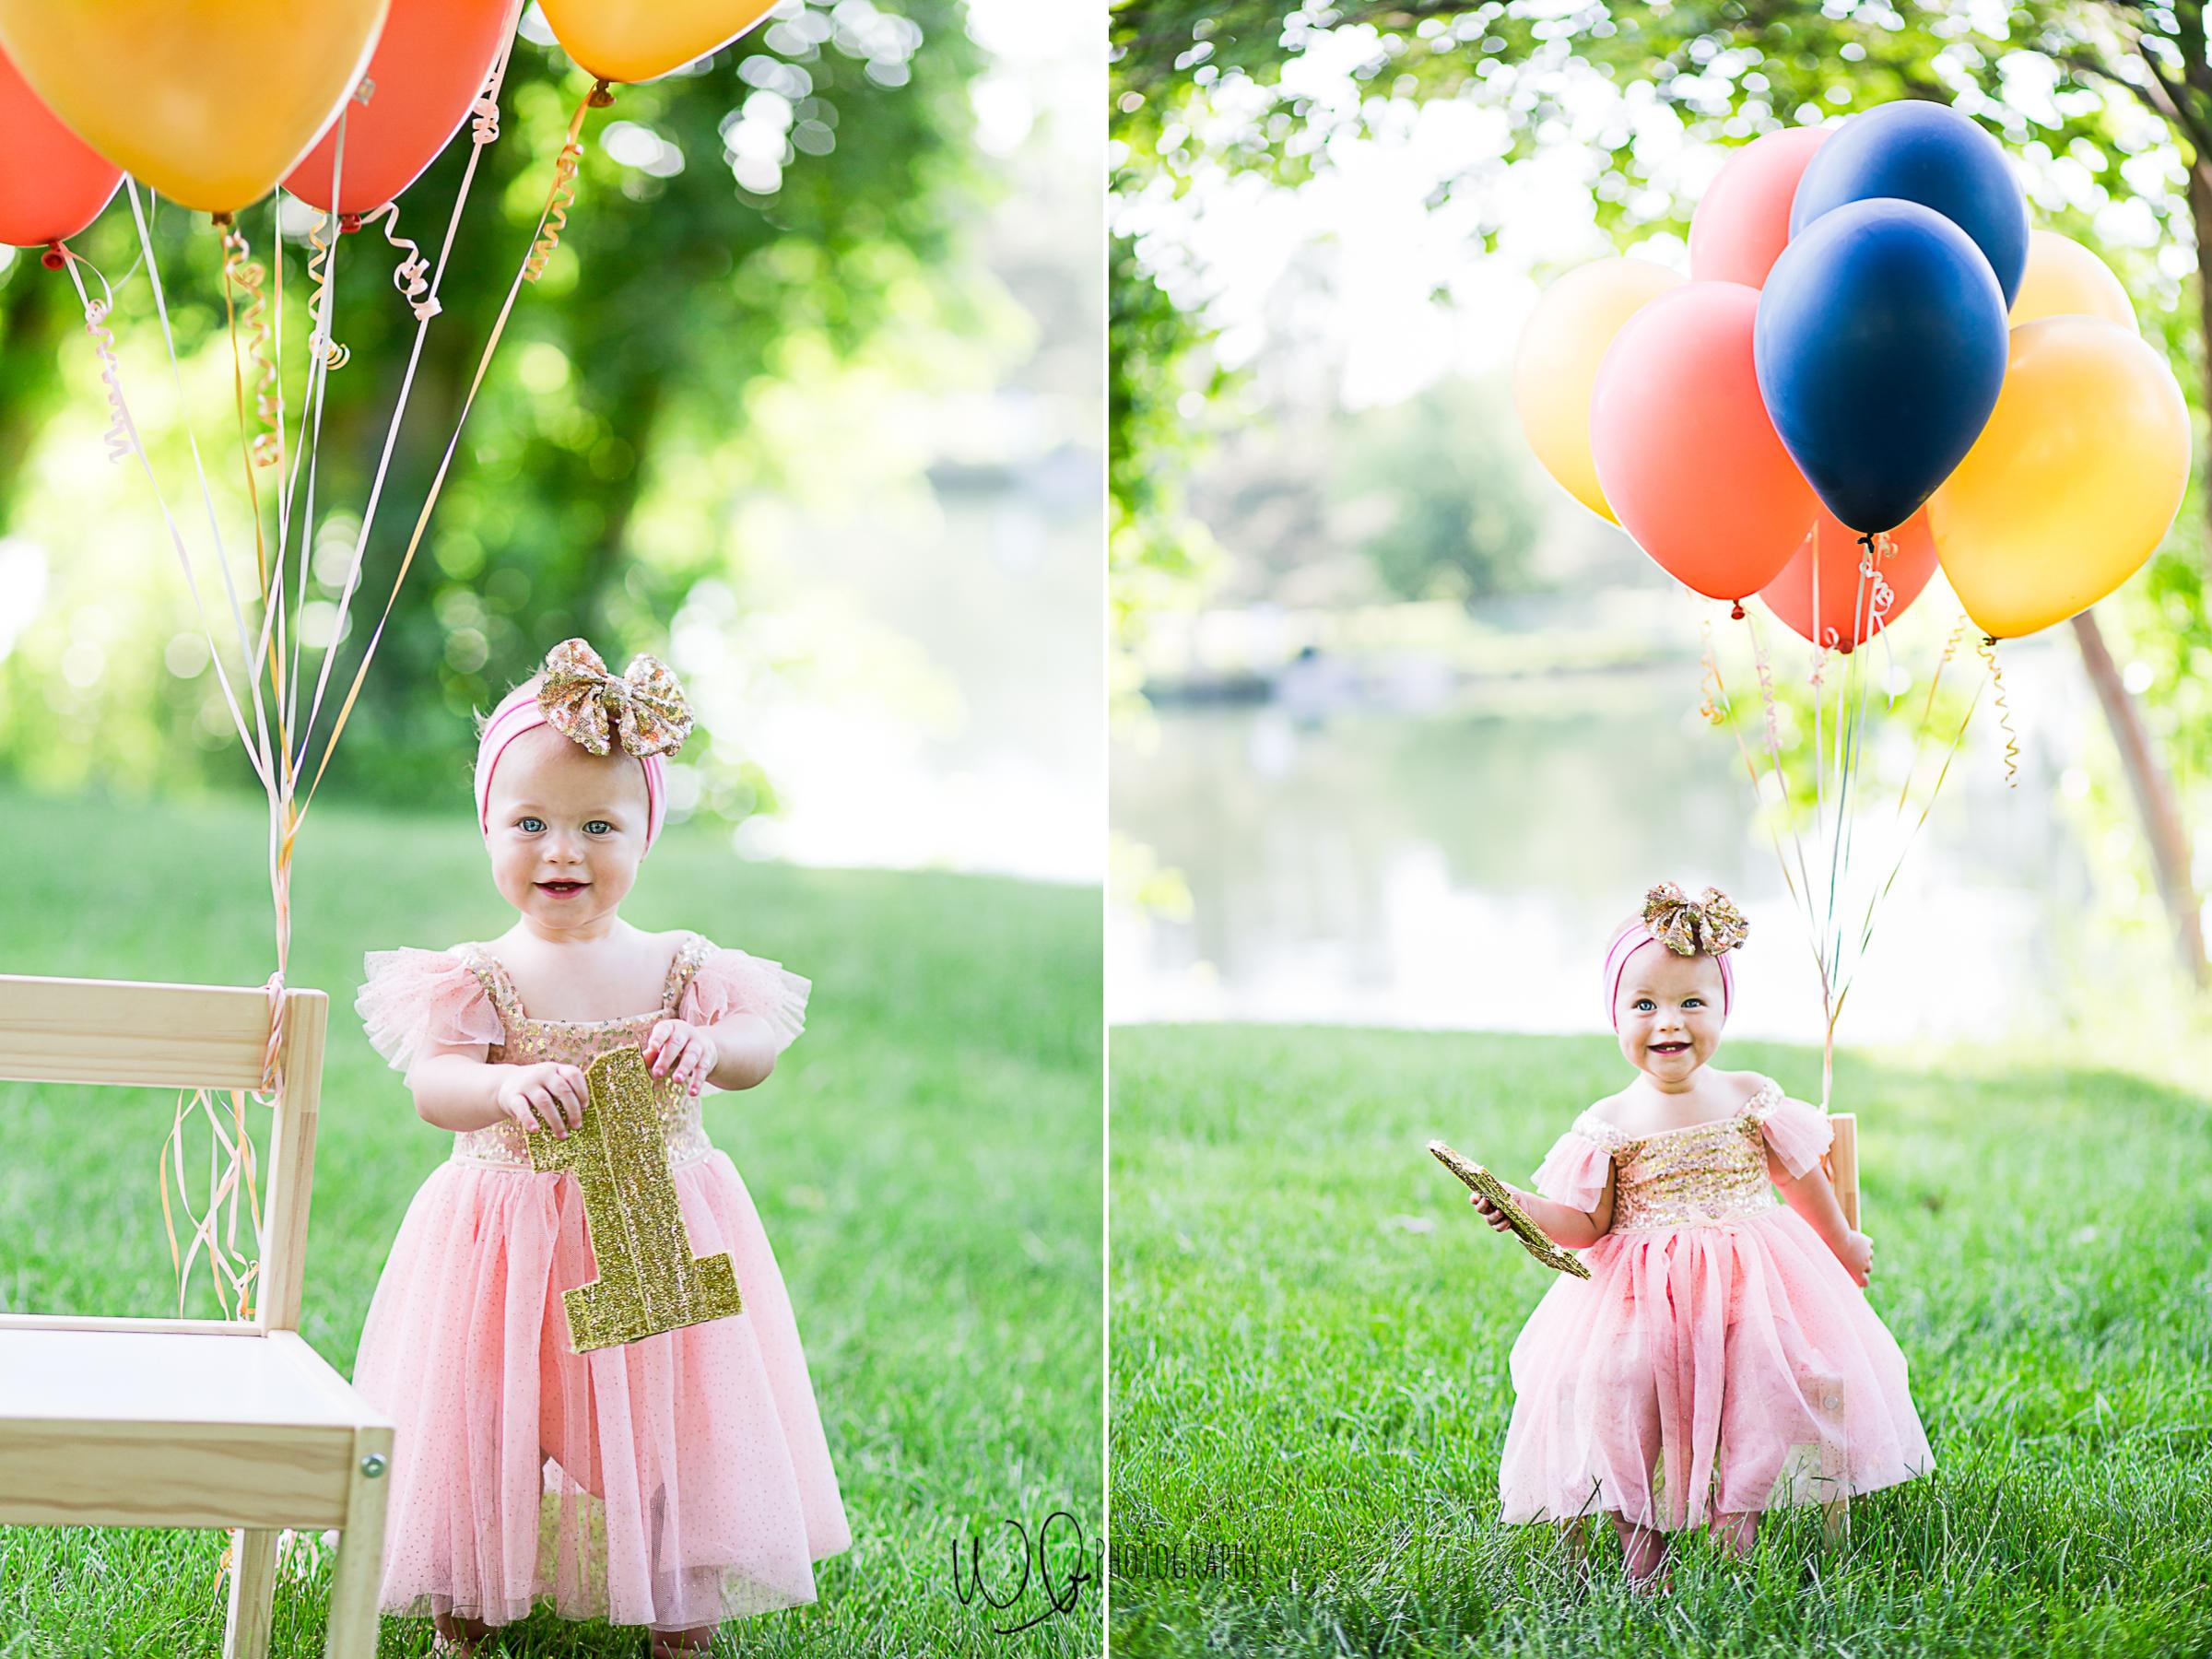 one years old balloon photo shoot